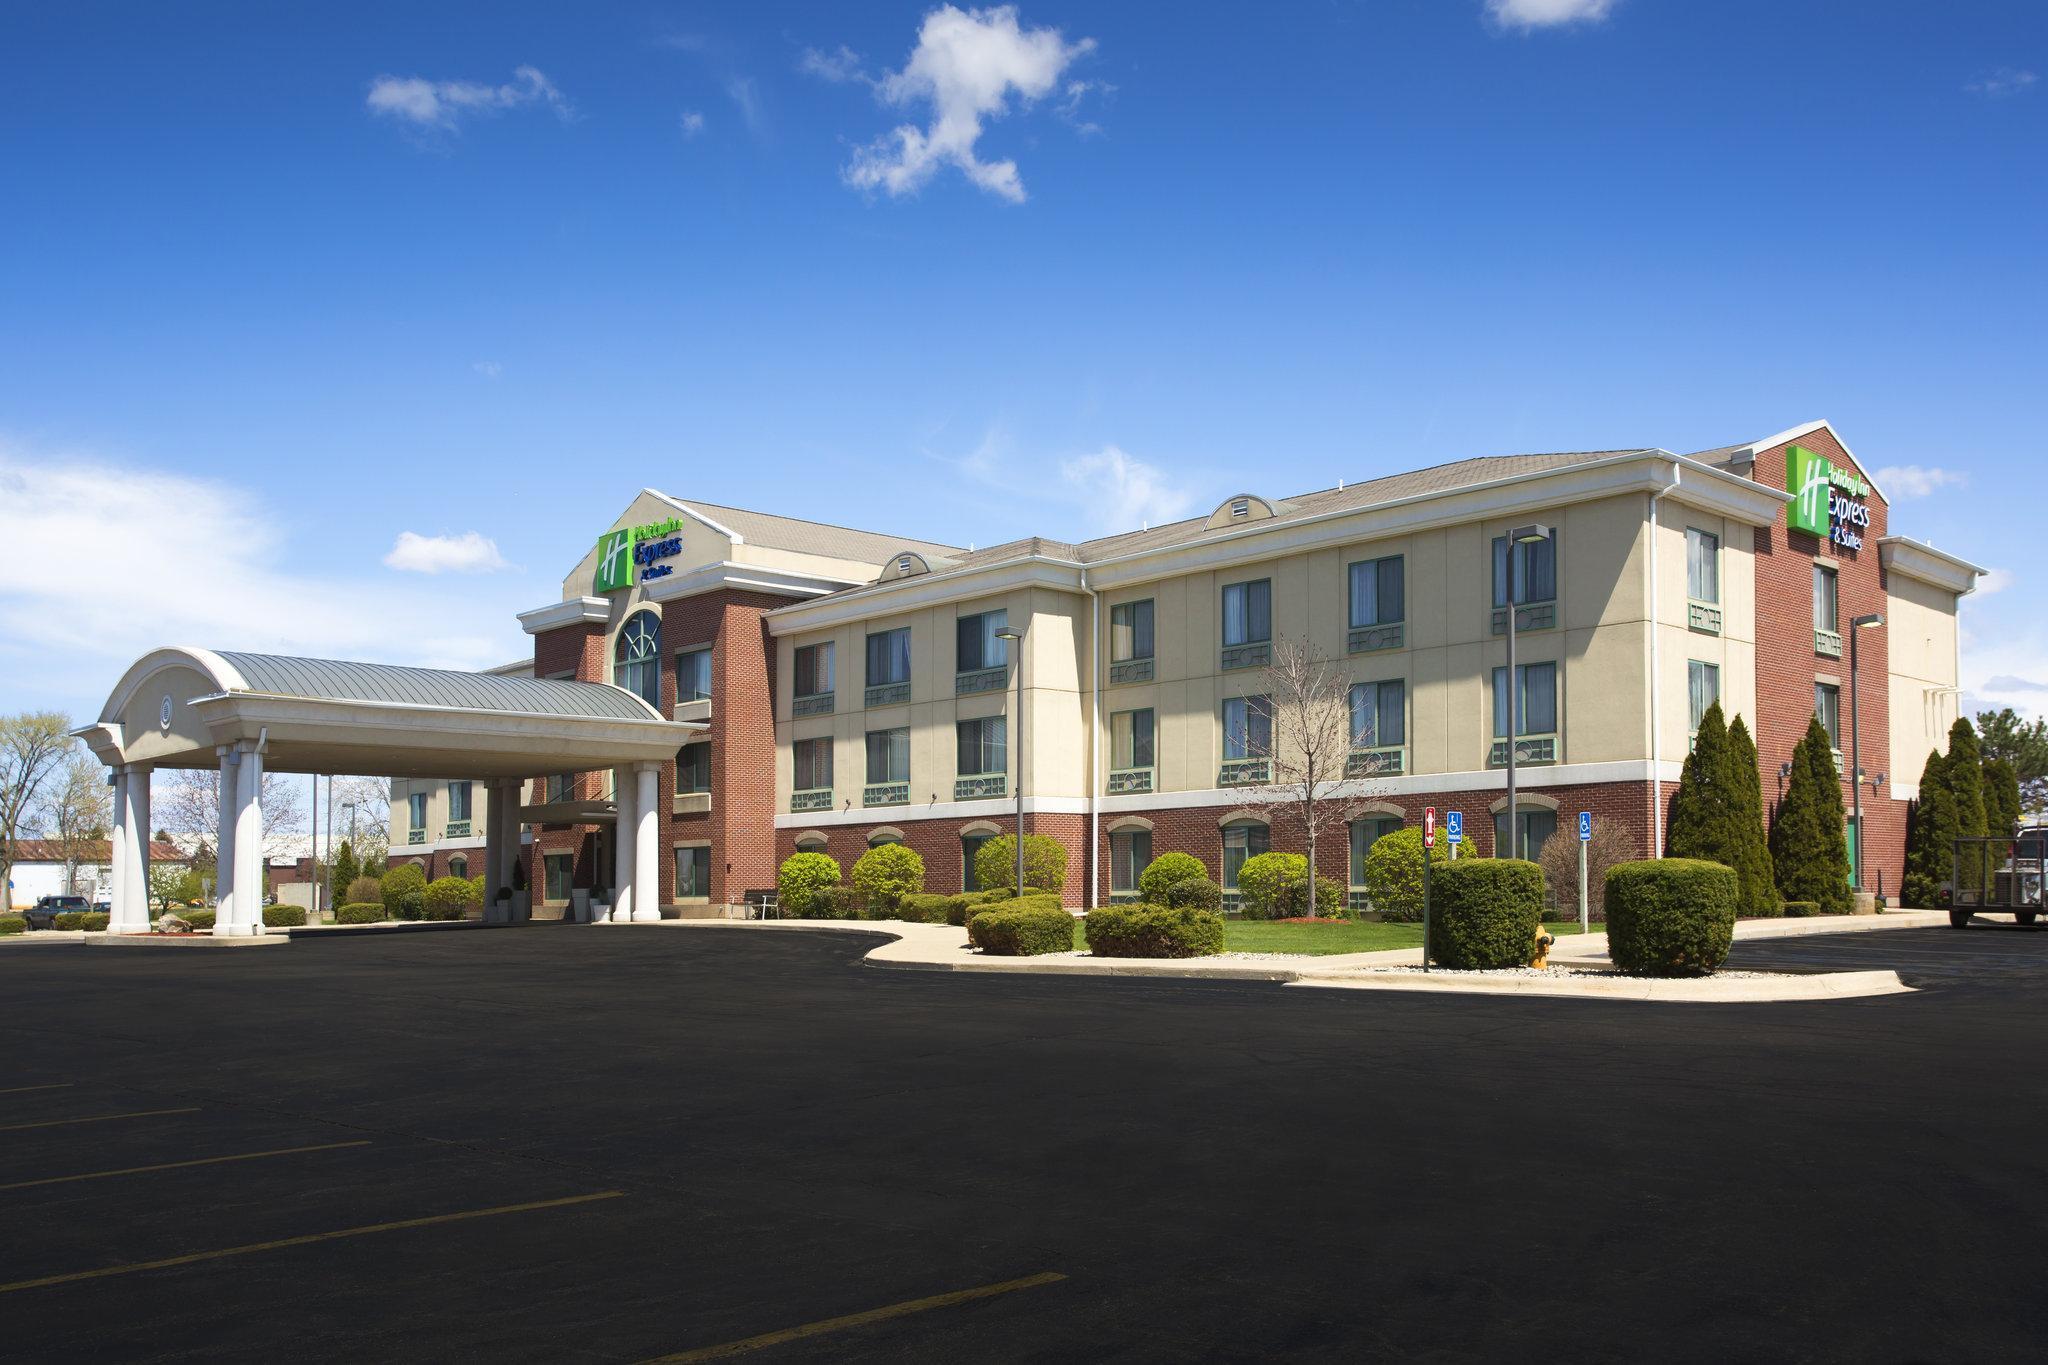 Holiday Inn Express Hotel And Suites Kalamazoo